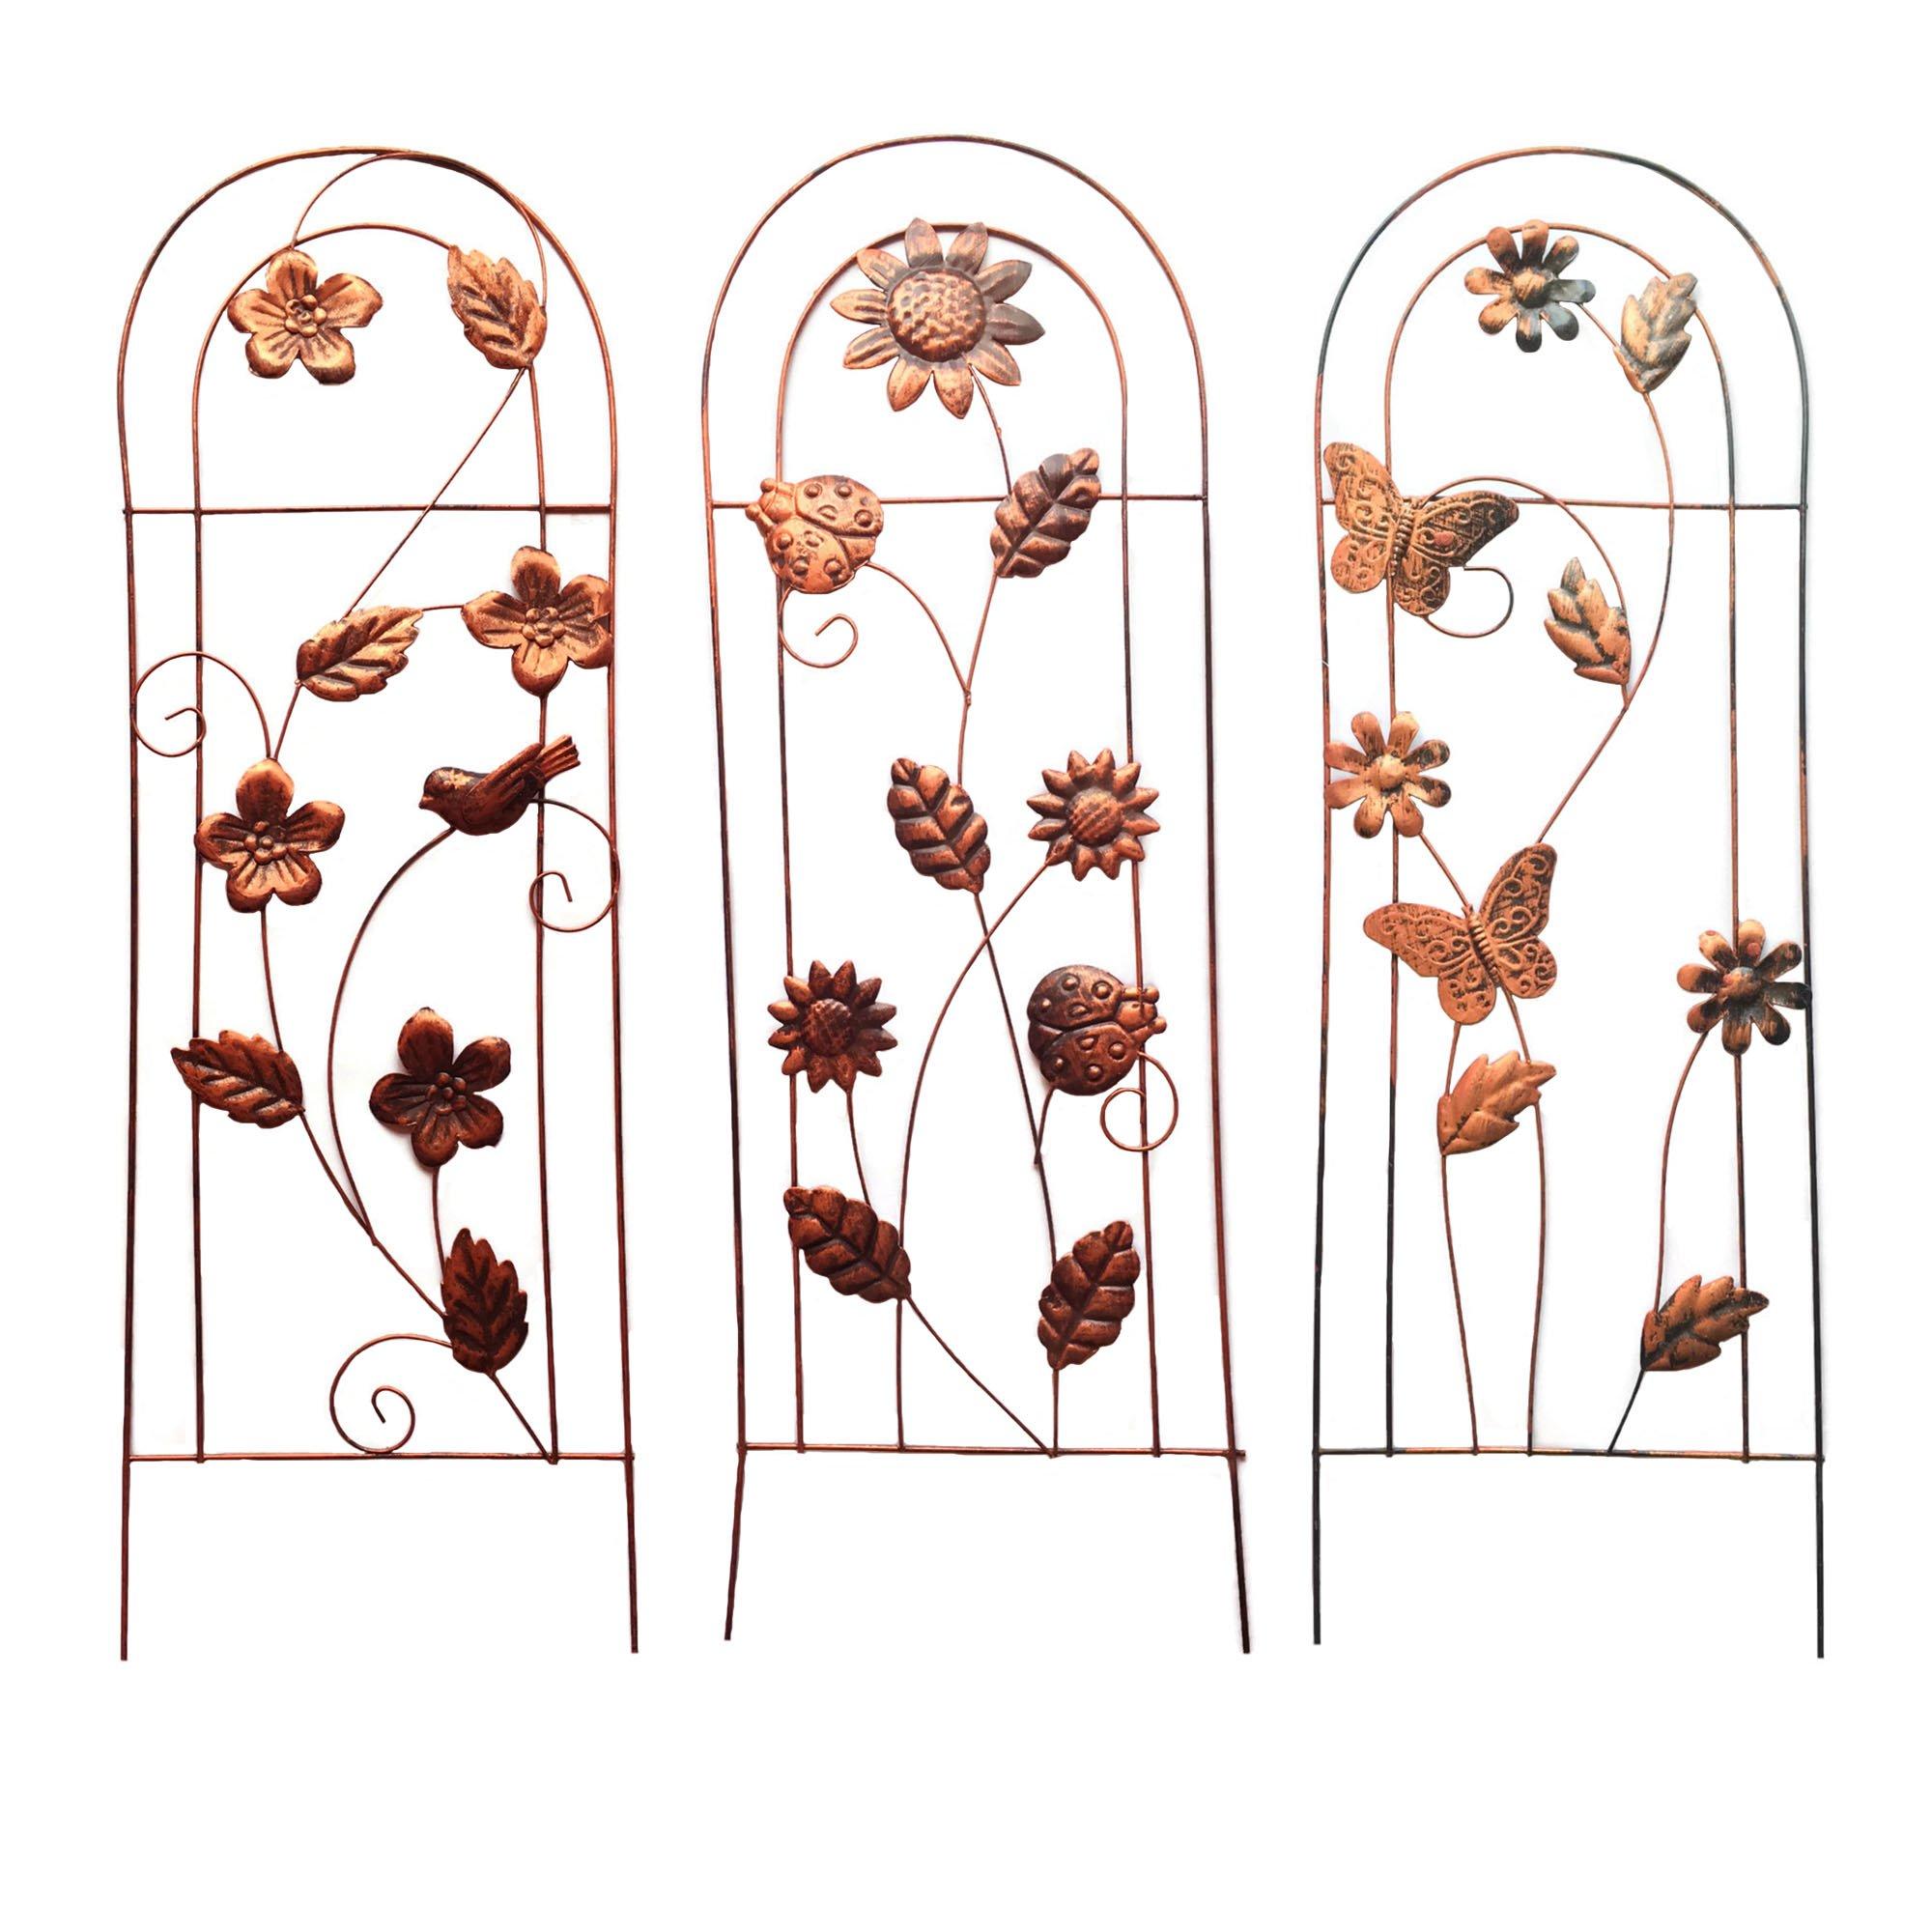 Garden Trellis For Climbing Plants & Vining Flowers Bundle: Three Items: Assortment Of 3 26'' x 9'' Metal Stake Garden Trellises